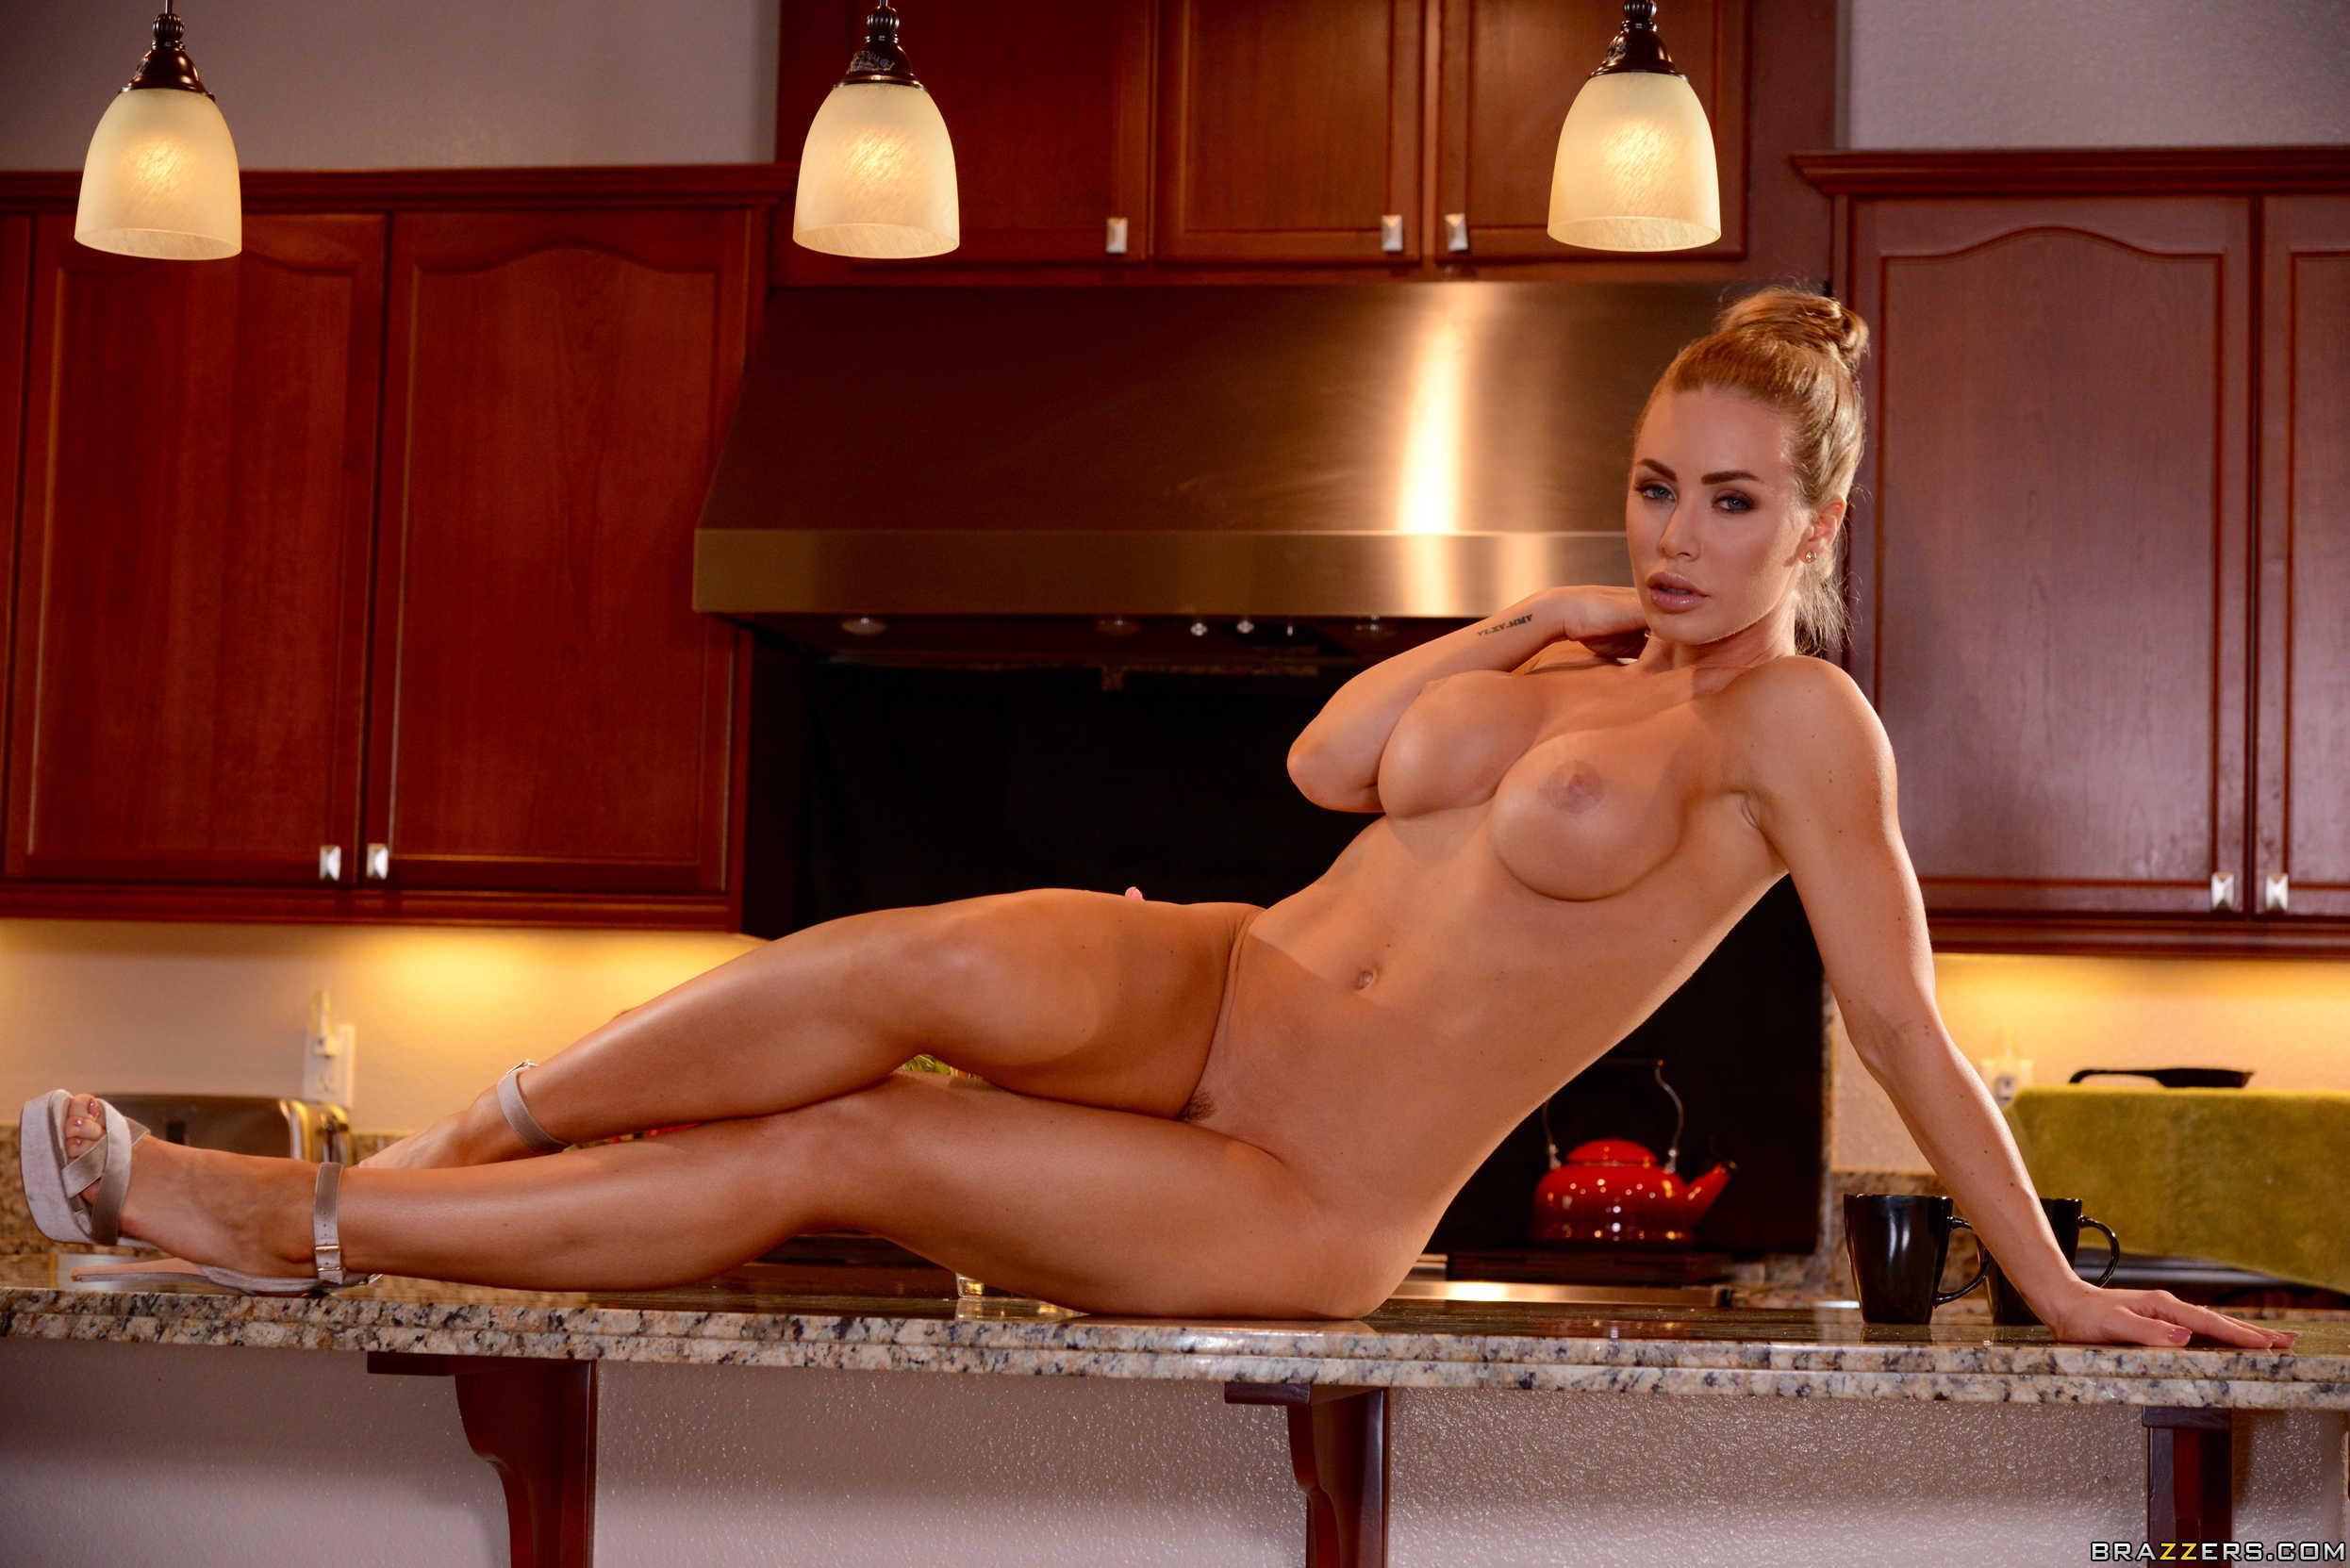 Nicole moser sexy pics, photos and links